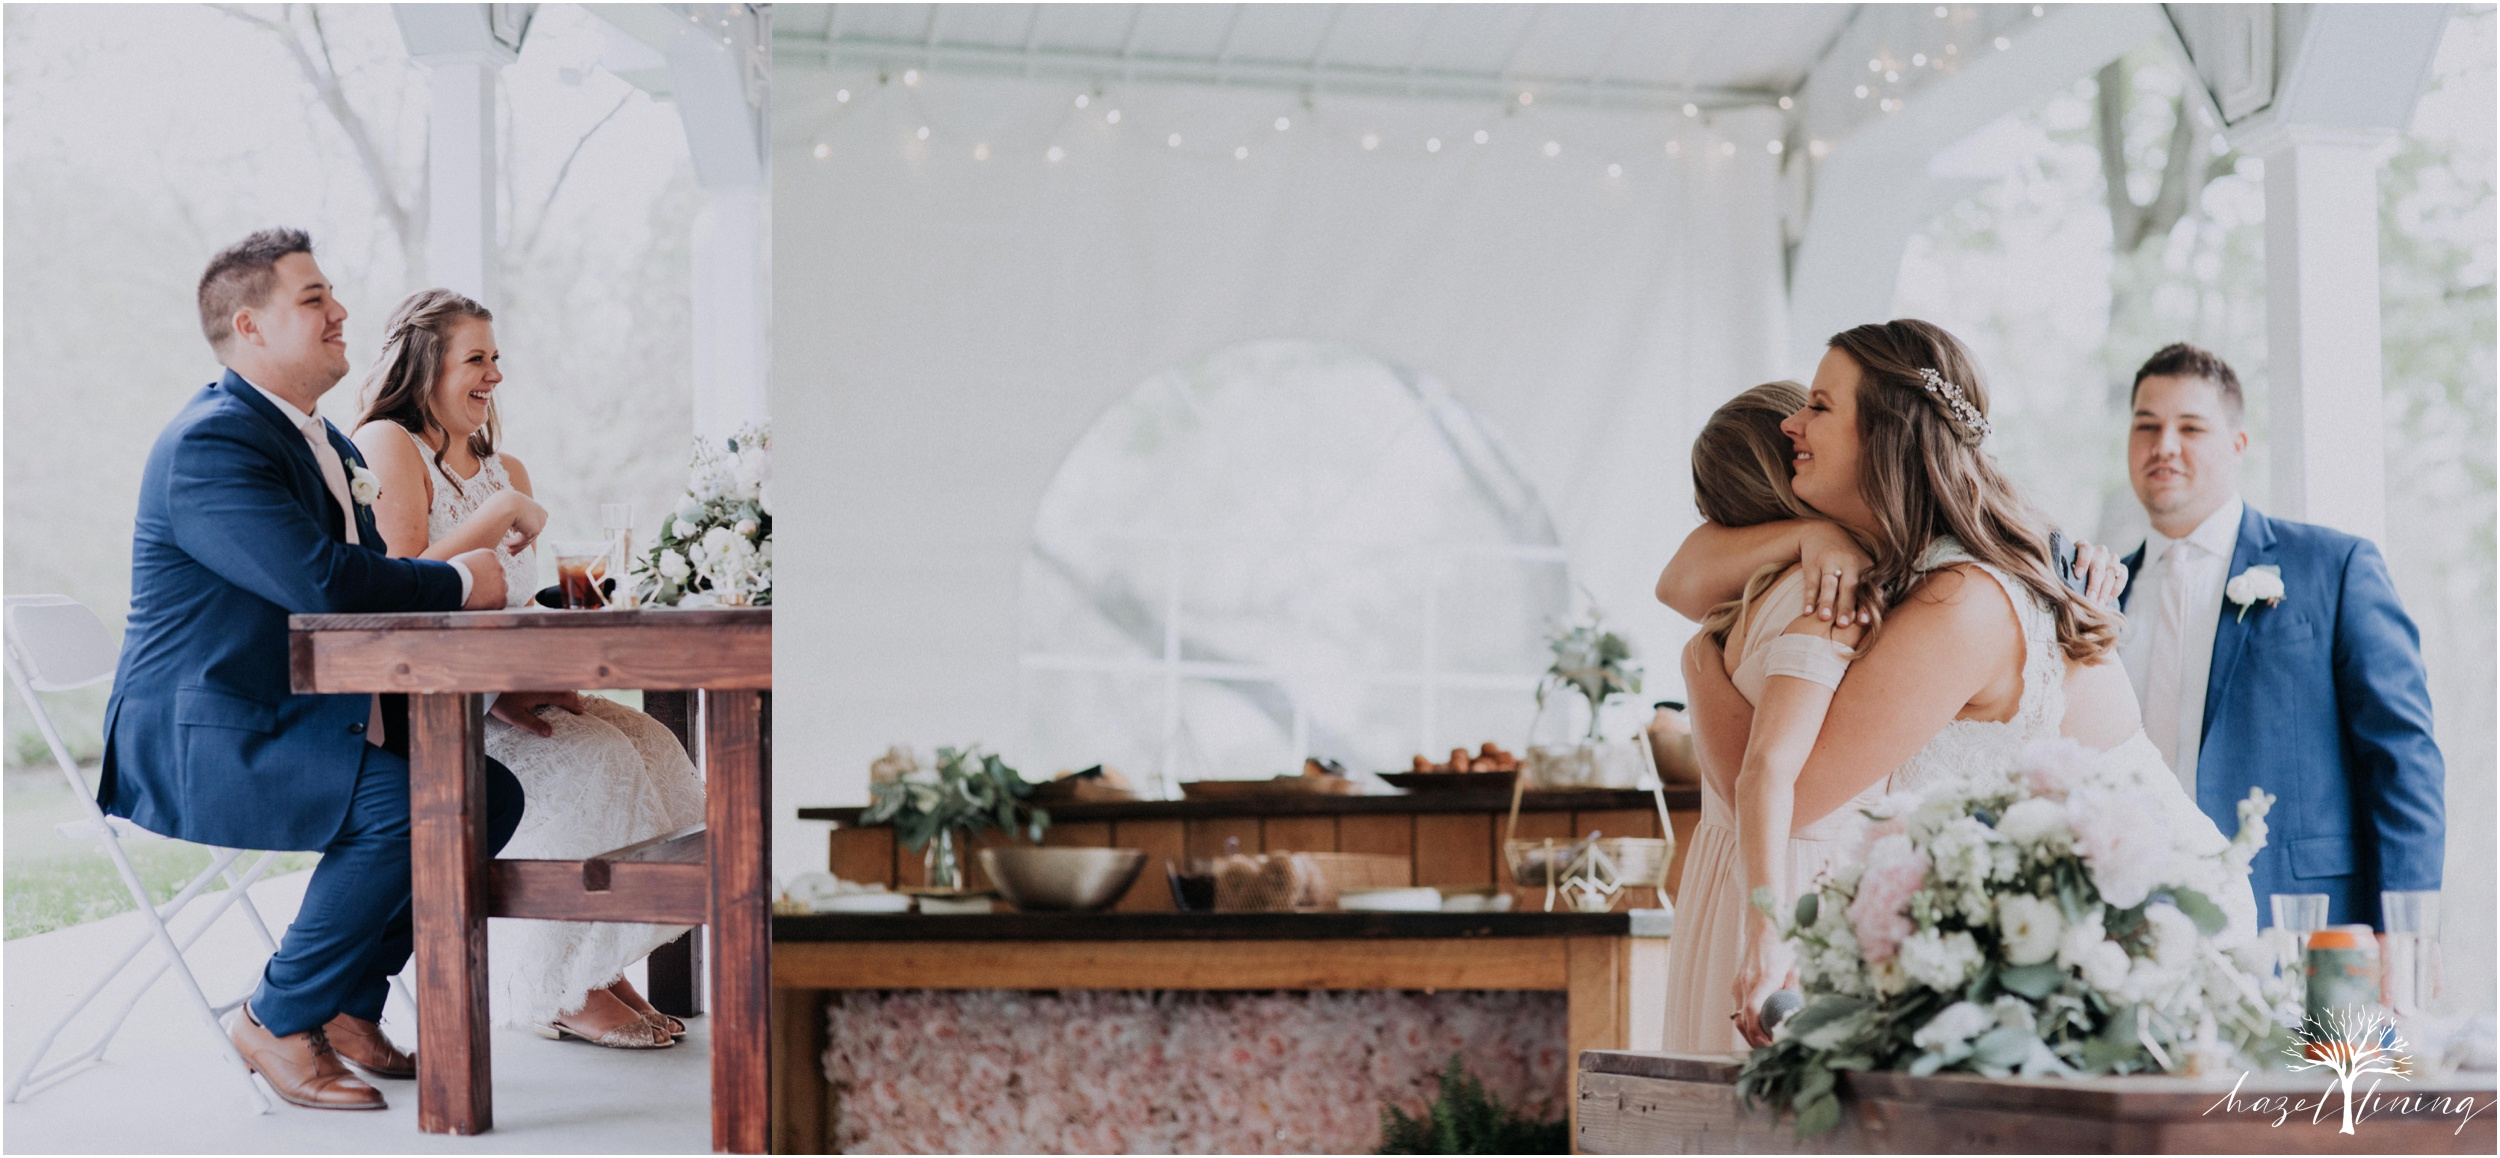 hazel-lining-travel-wedding-elopement-photography-abby-skyler-hunt-the-willis-house-york-pennsylvania-outdoor-estate-wedding_0119.jpg